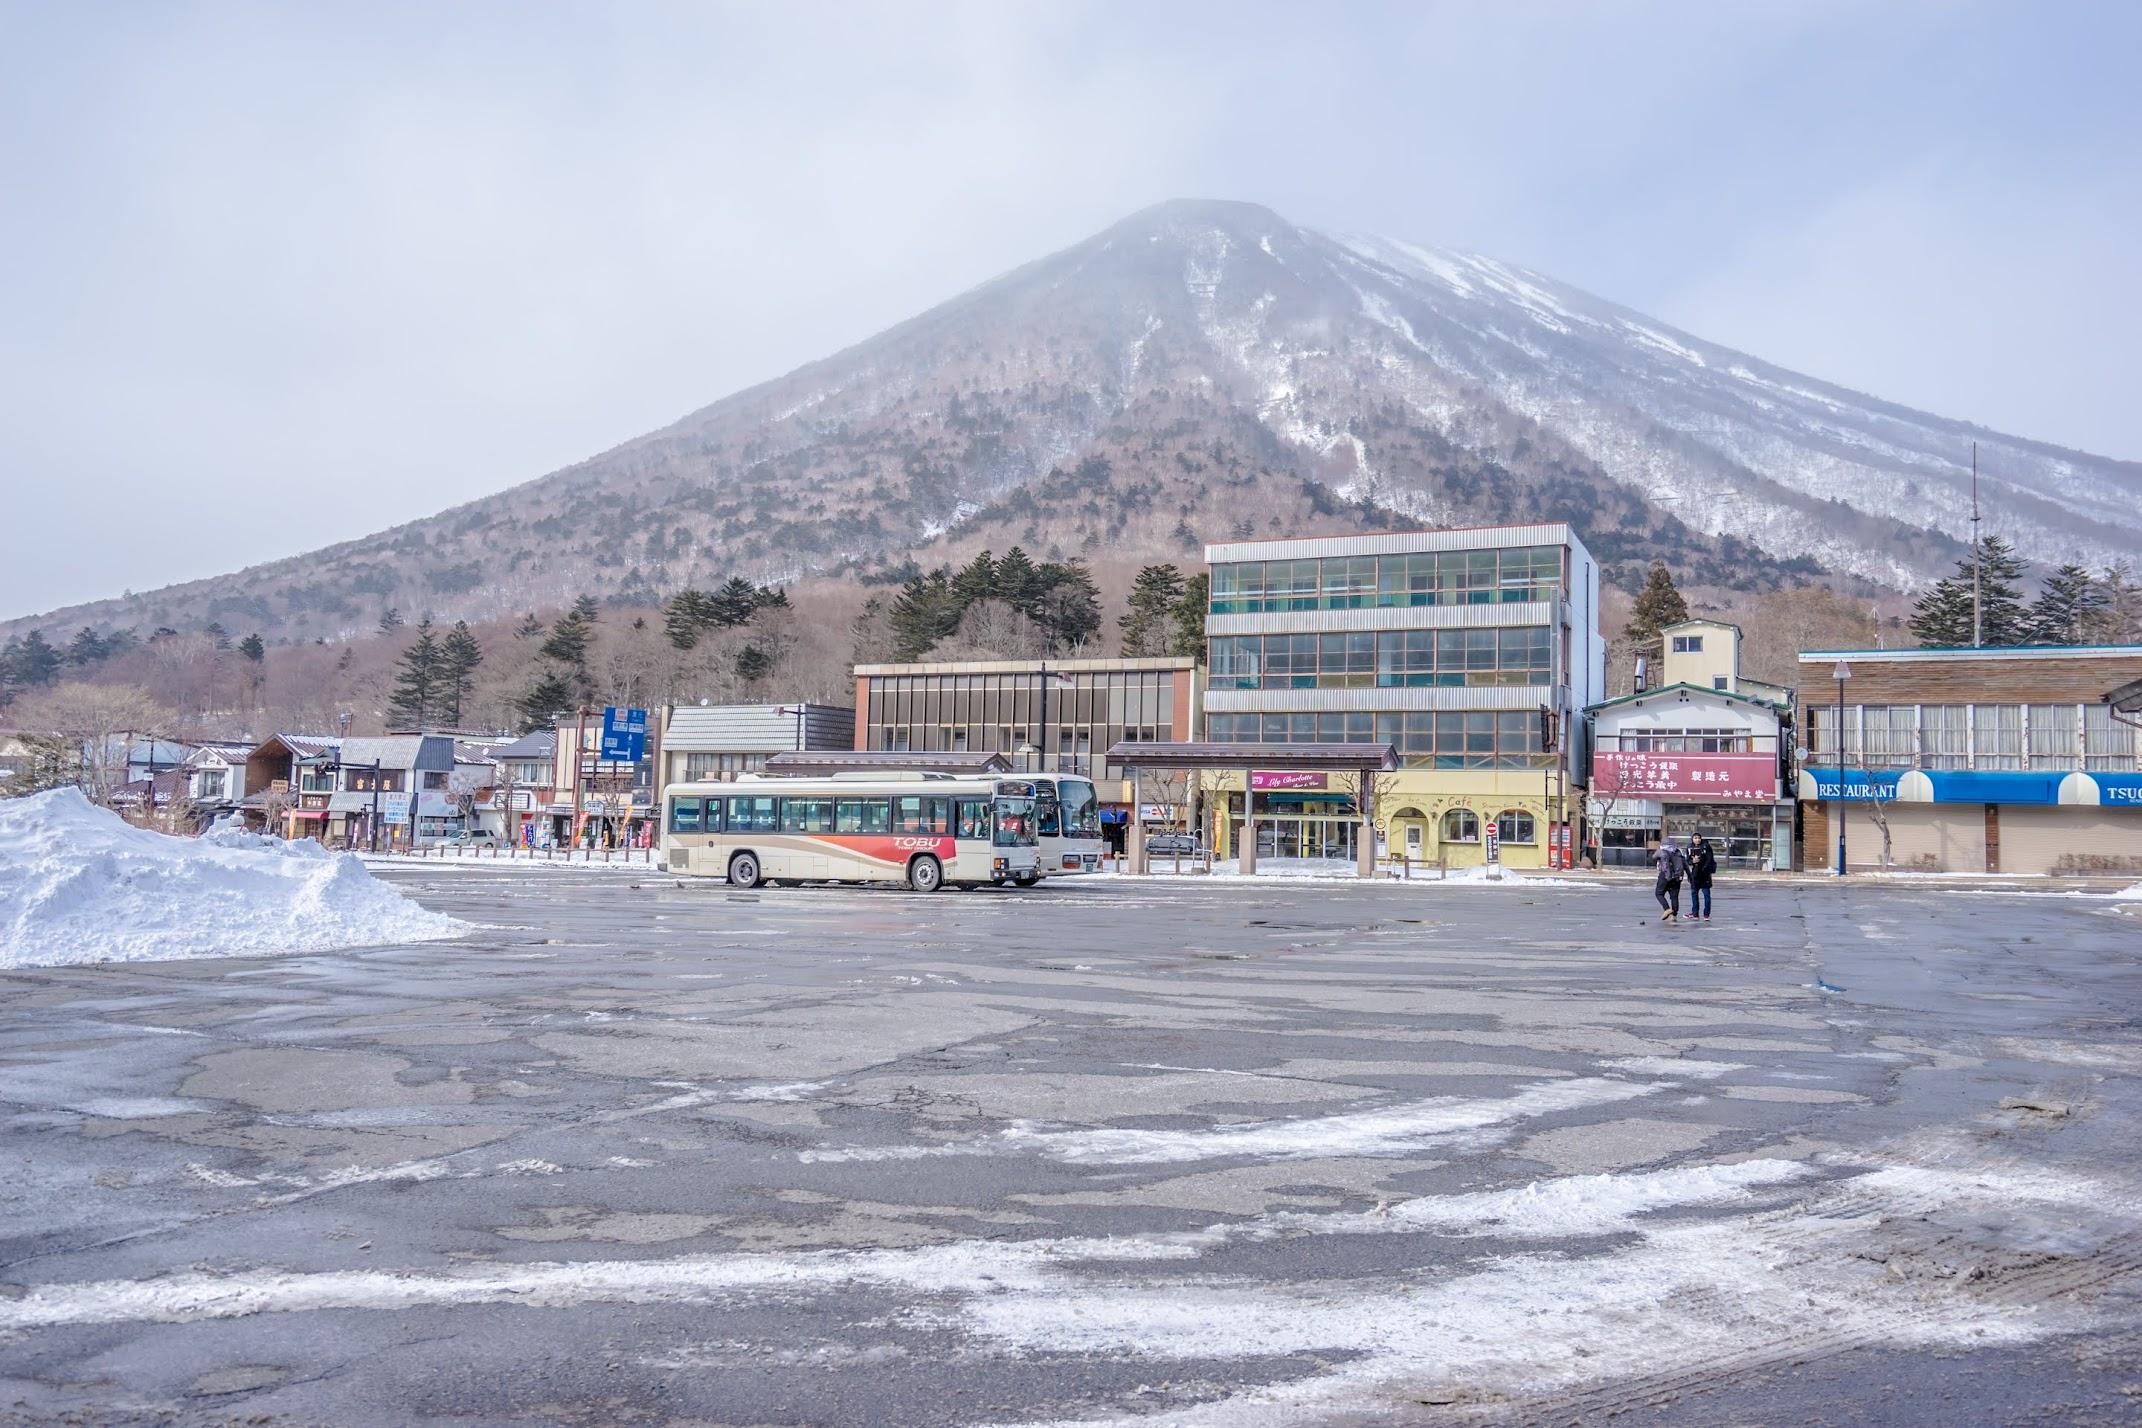 Chuzenji Onsen Bus Terminal